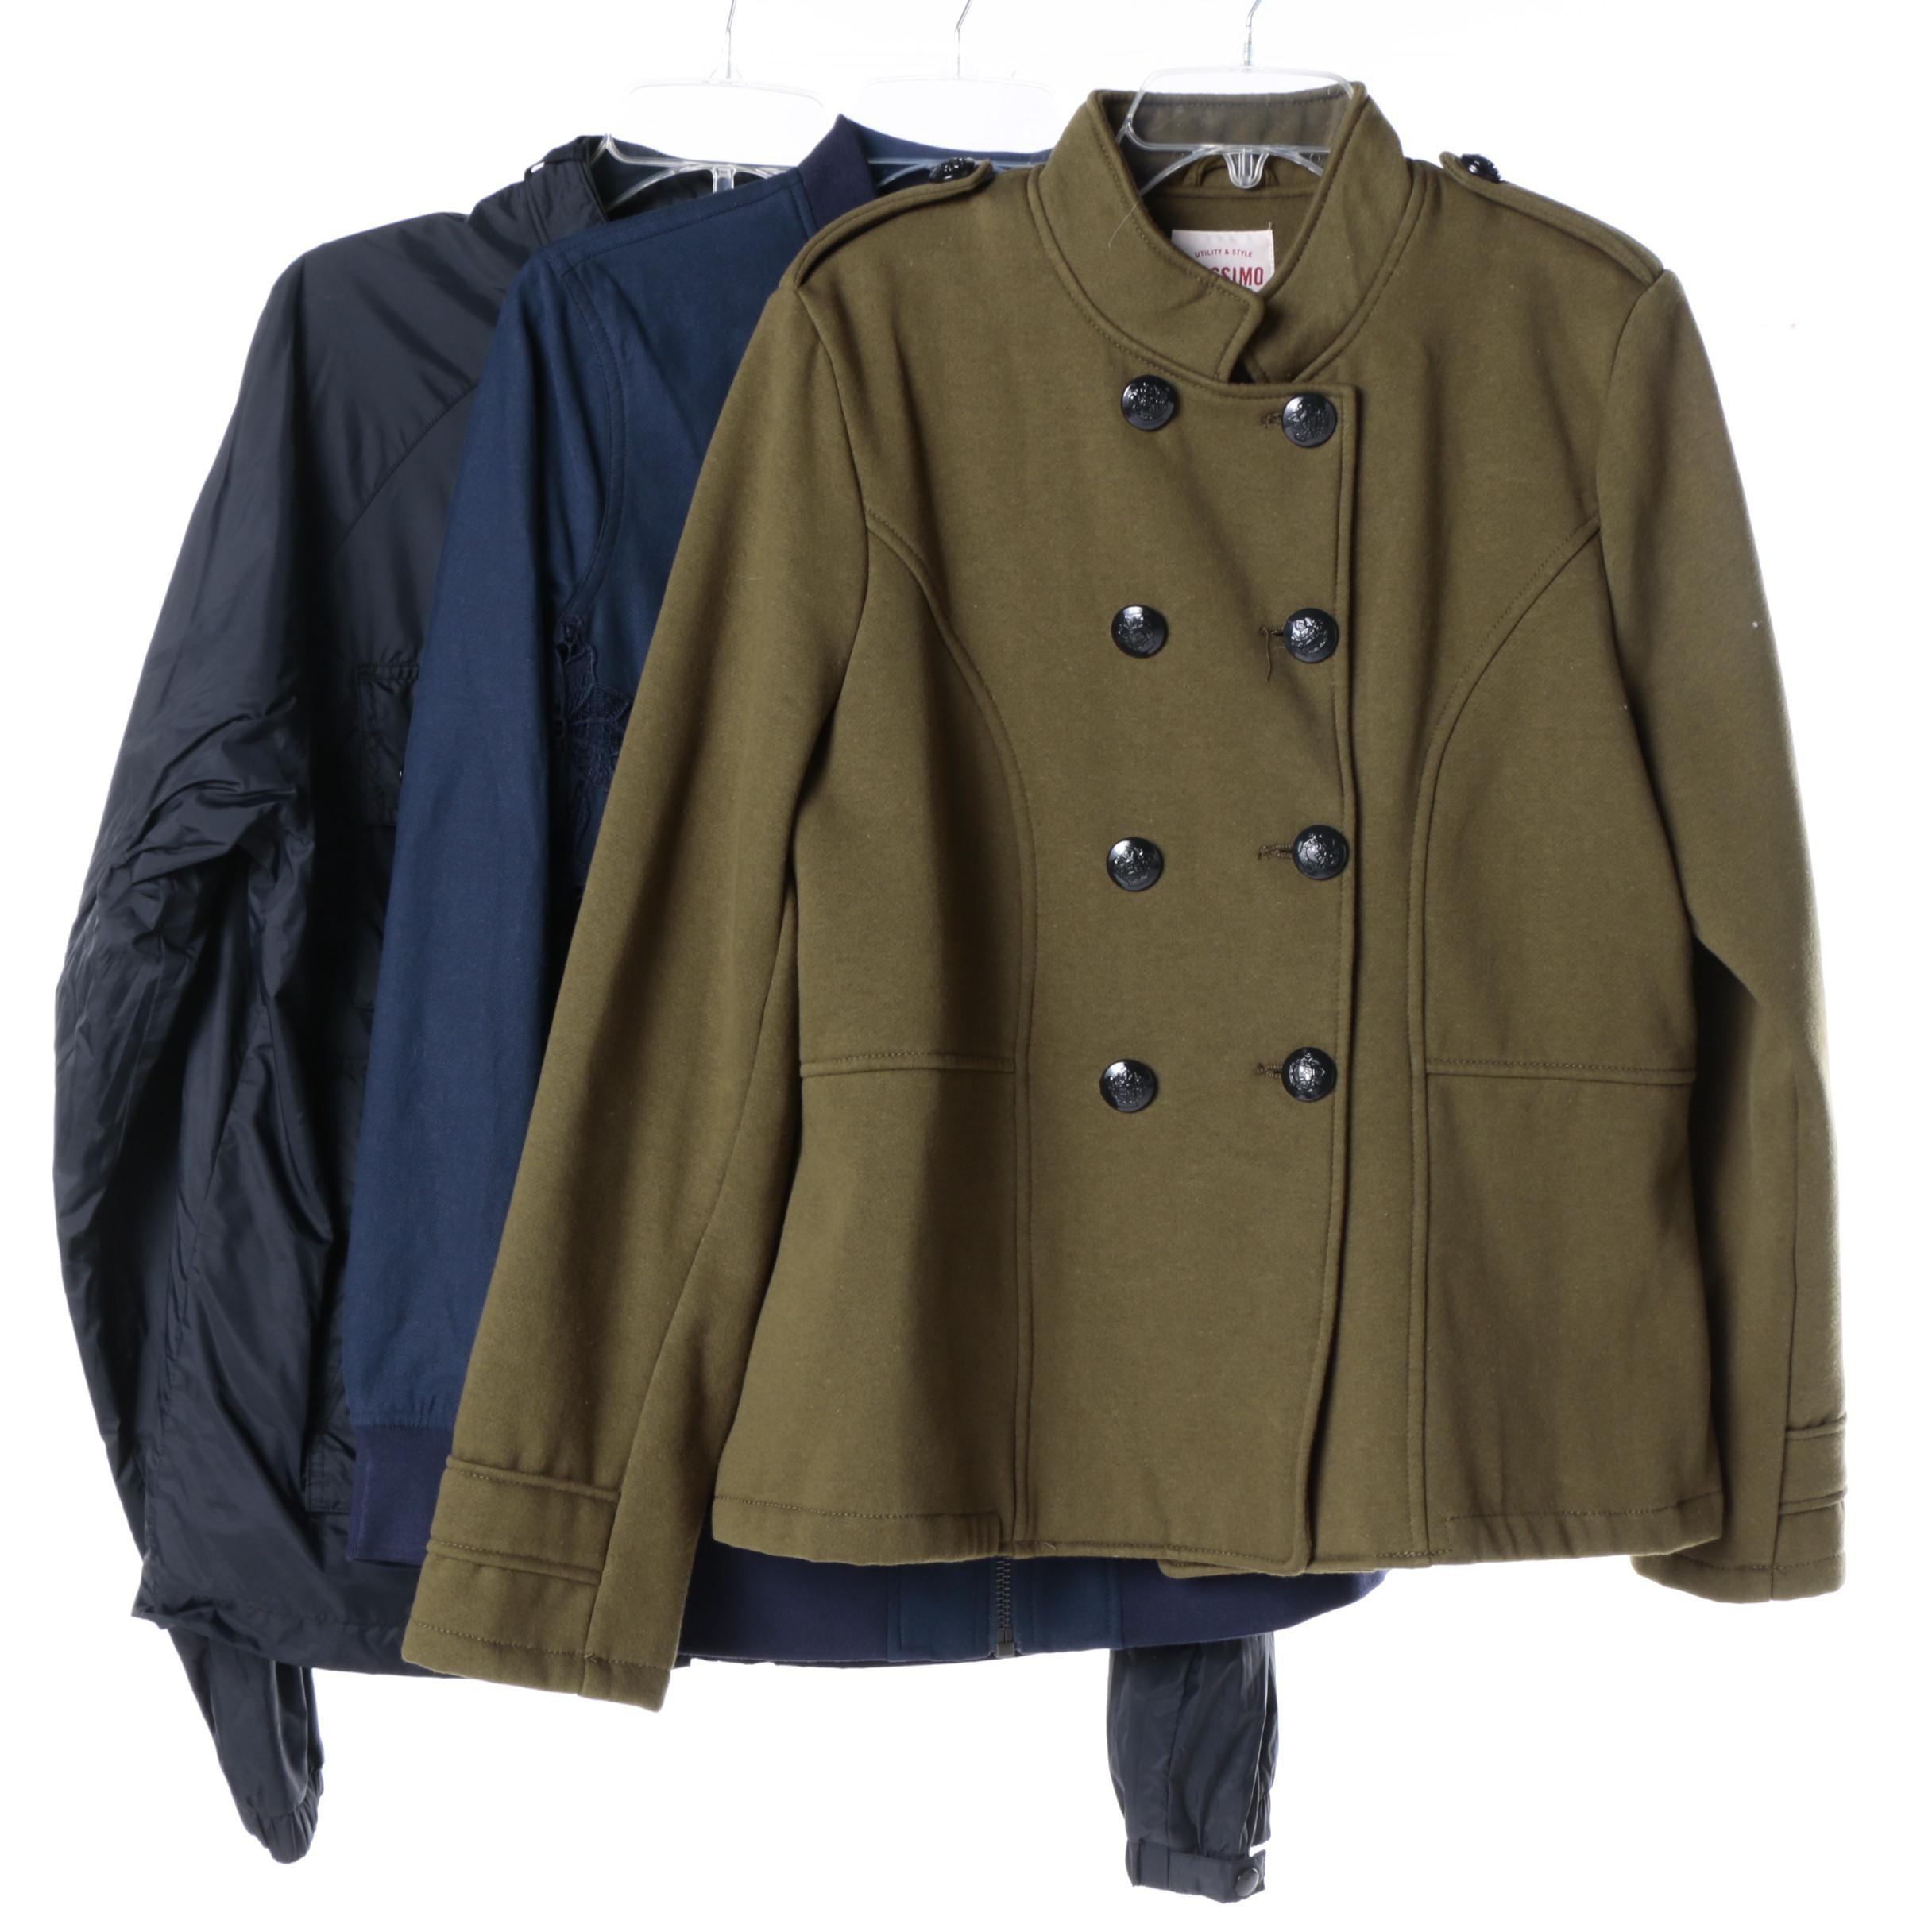 Women's Jackets Including Lacoste L!ve